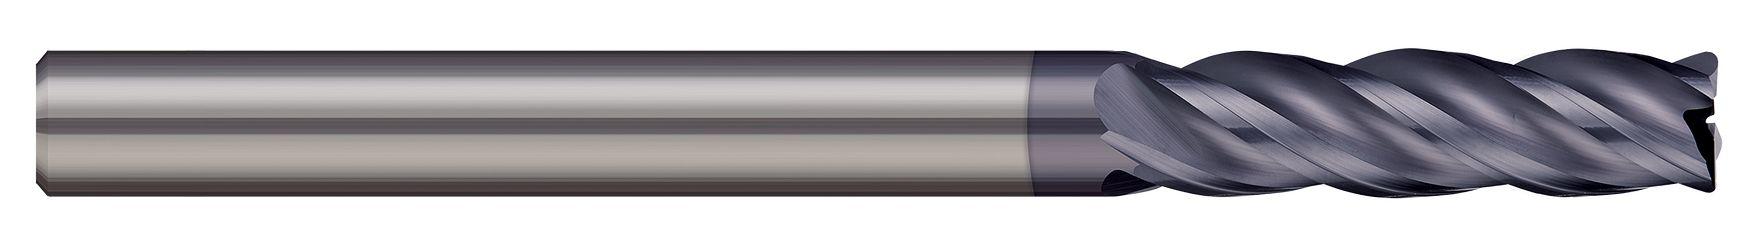 tool-details-VLM-625-4X